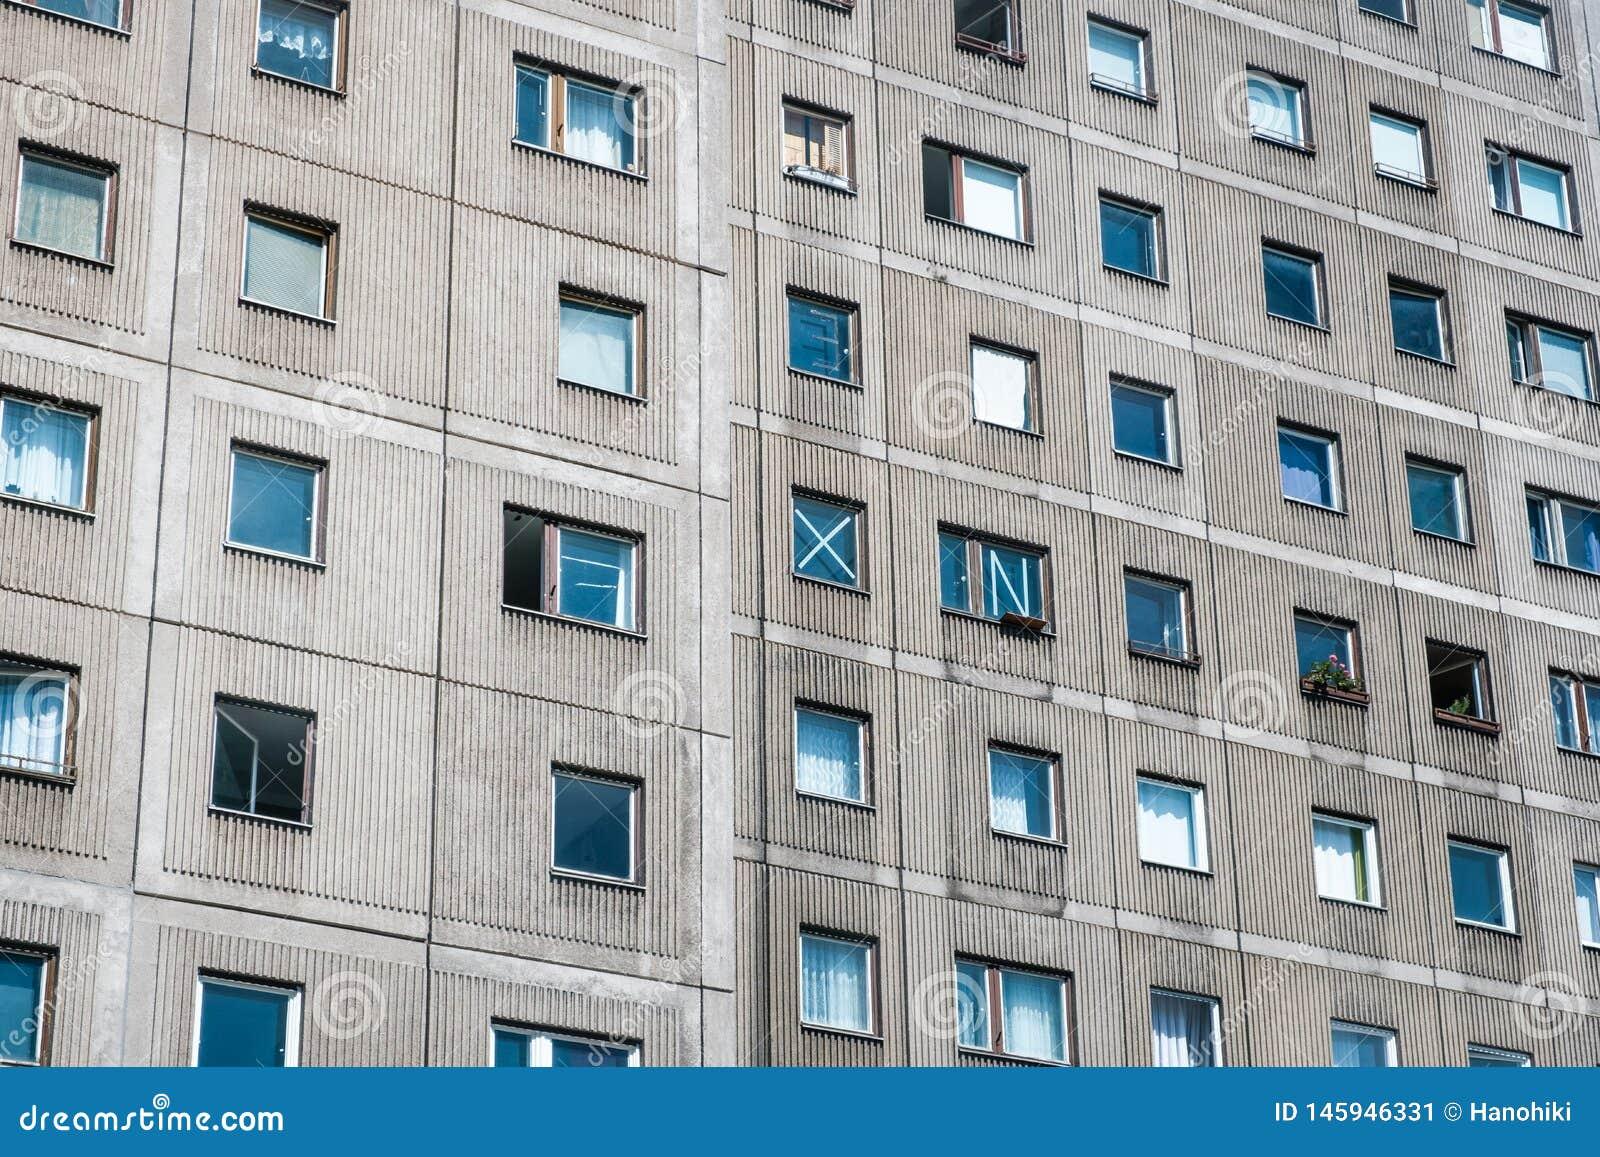 Building Facade, Plattenbau, Berlin - Precast Concrete Slabs House